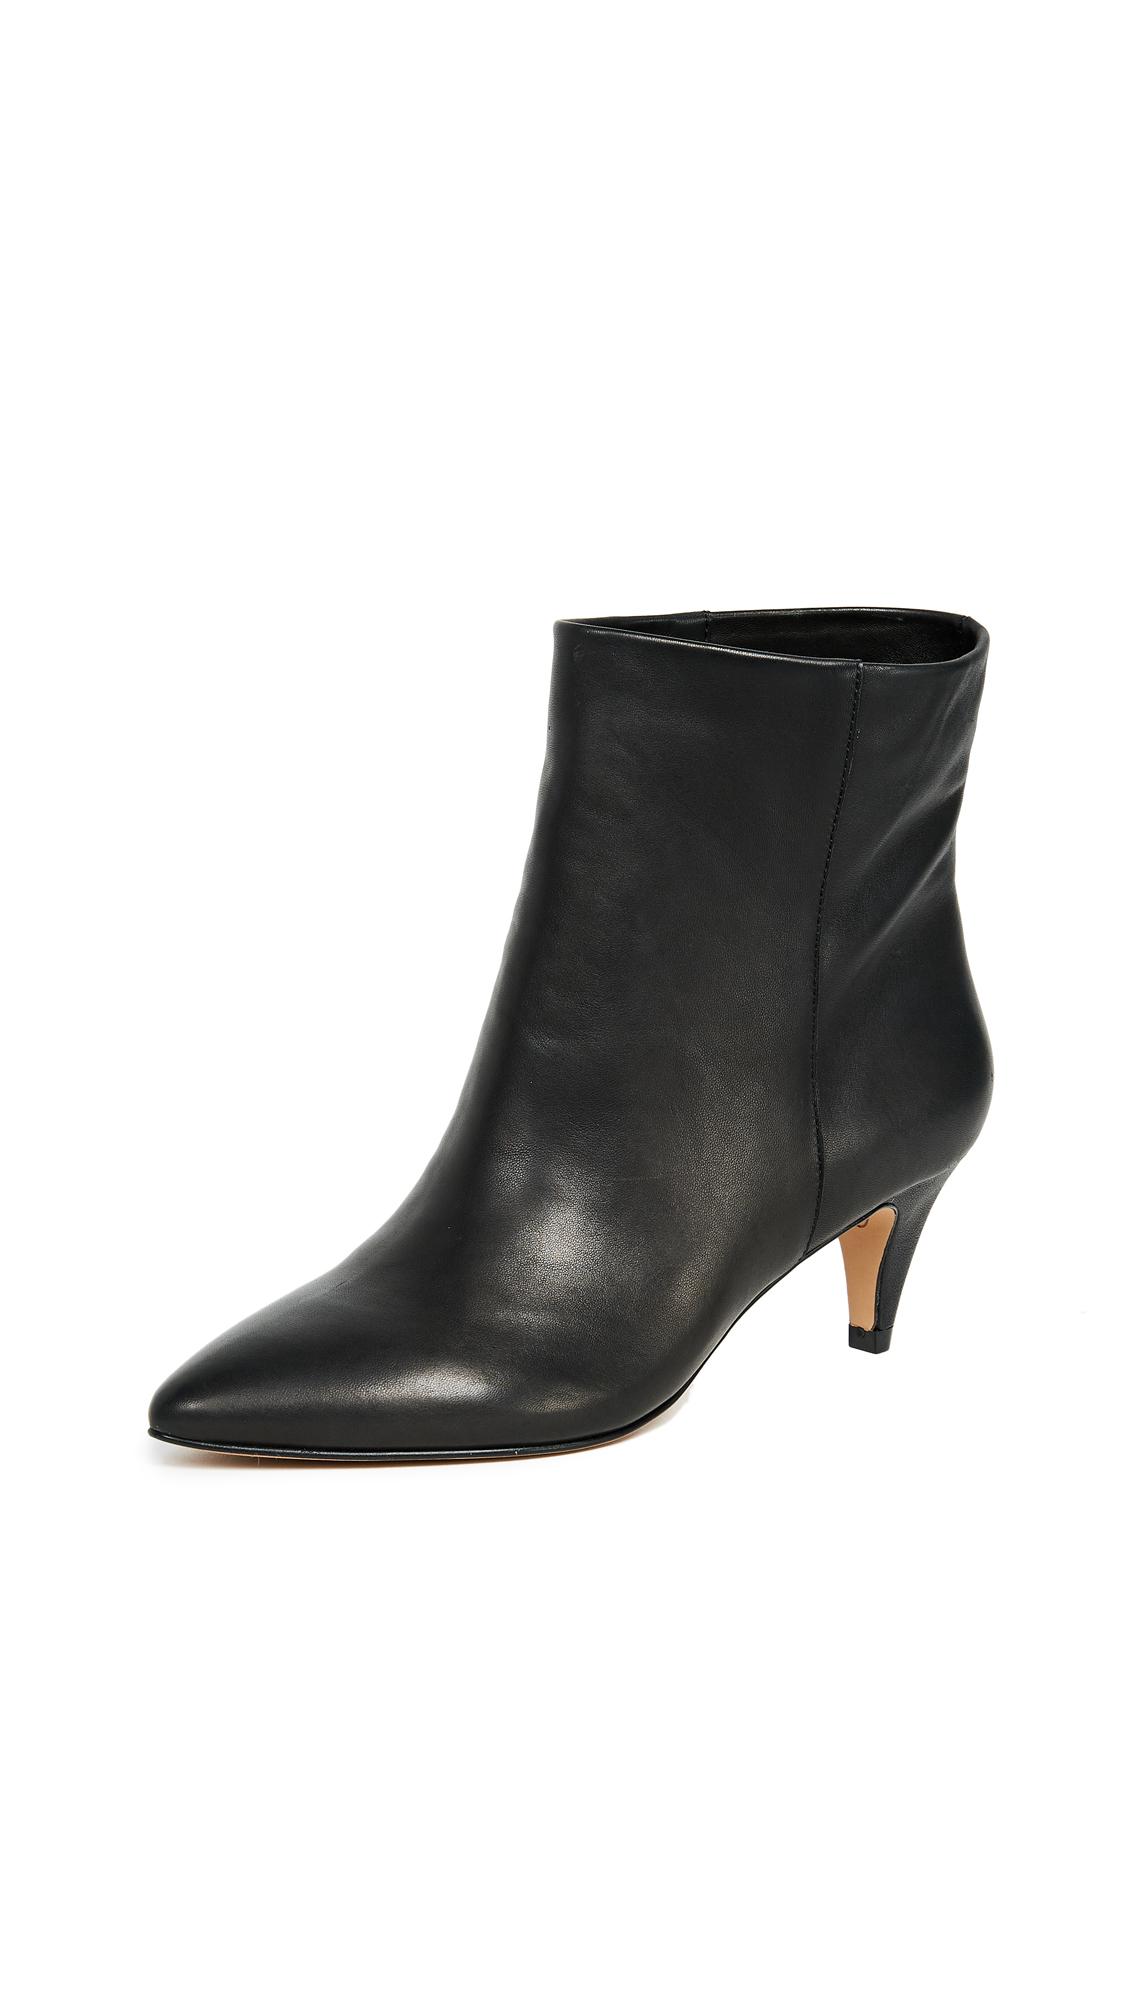 Dolce Vita Dee Booties - Black Leather